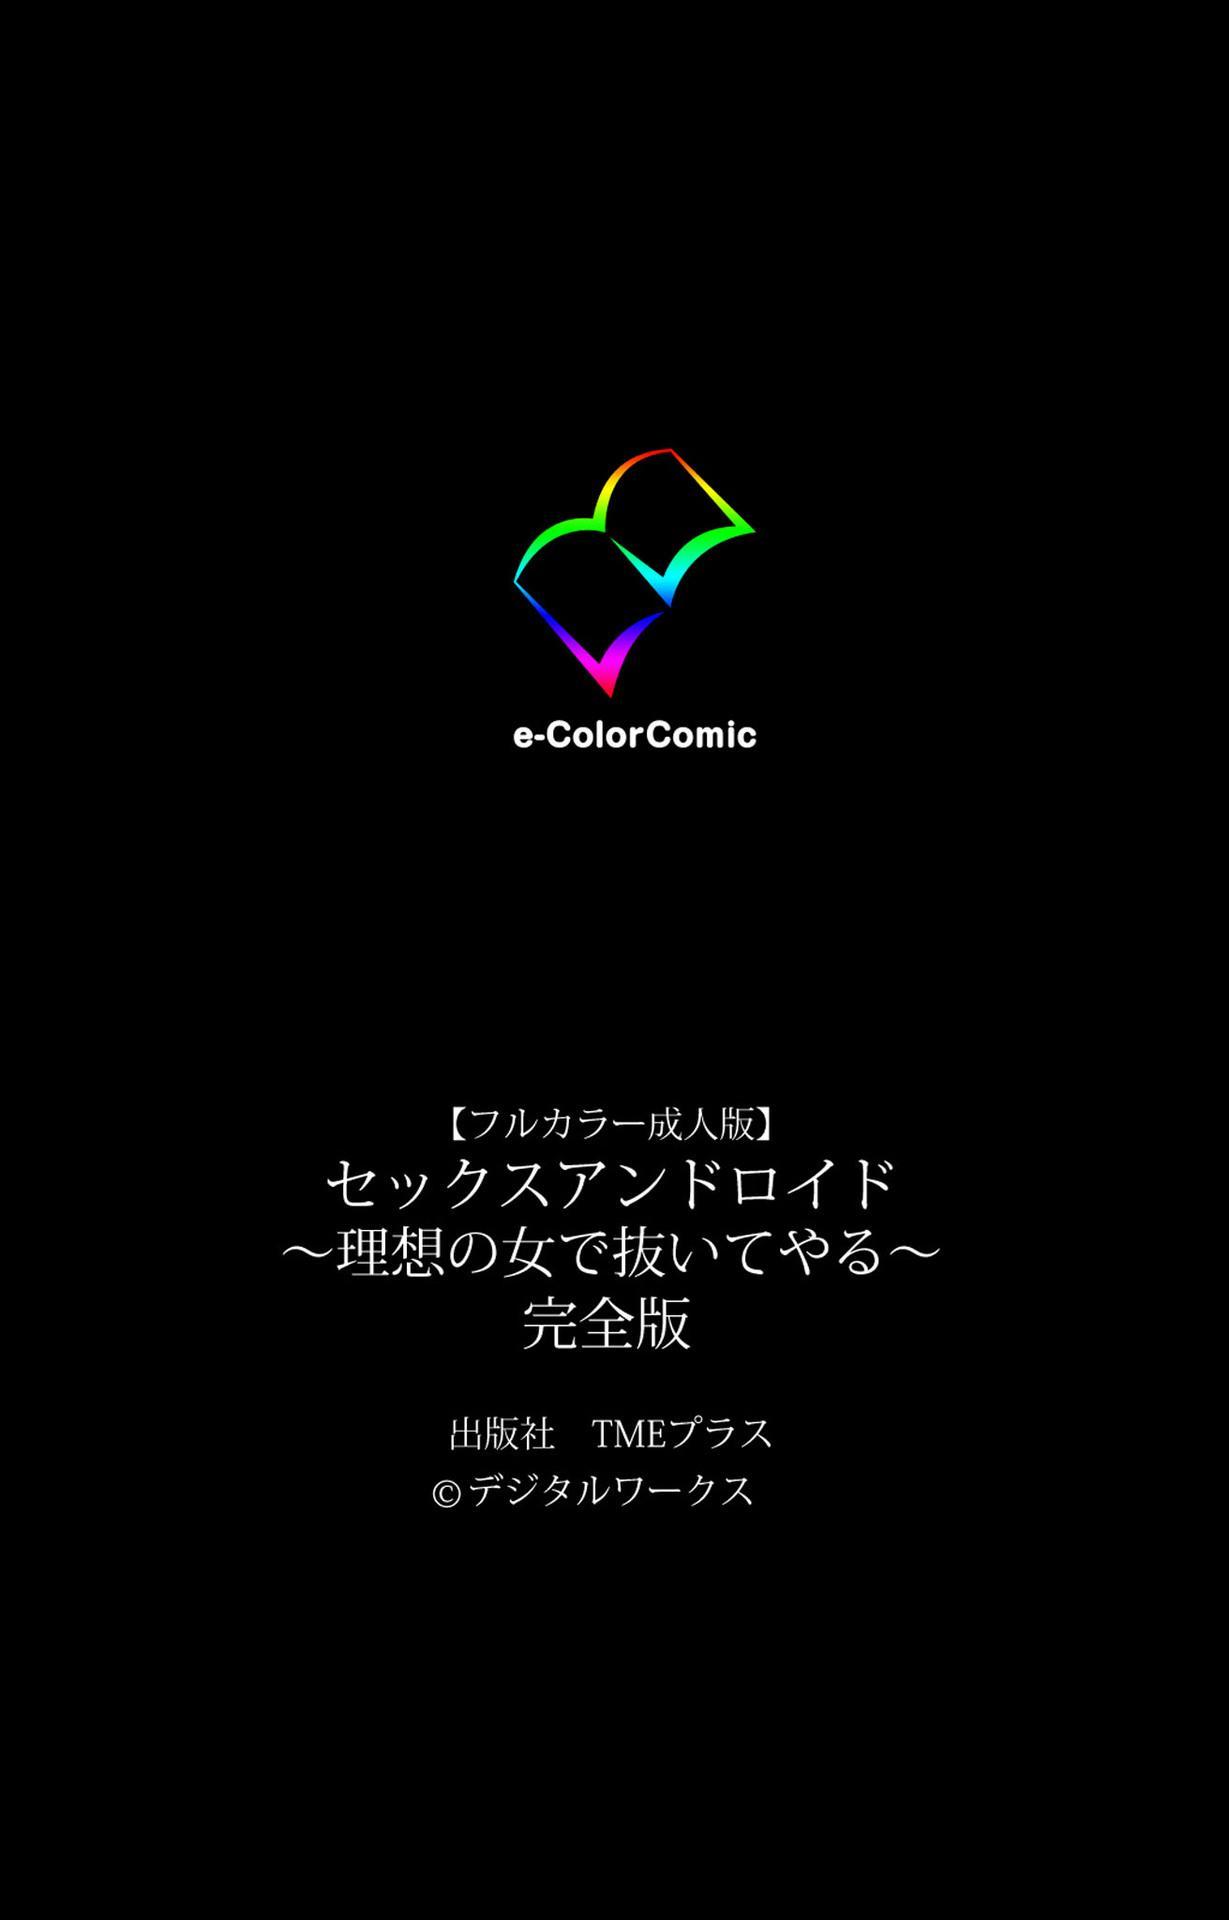 [Digital Works] [Full Color Seijin Ban] Sex Android ~Risou no Onna de Nuite yaru~ Kanzenban 242